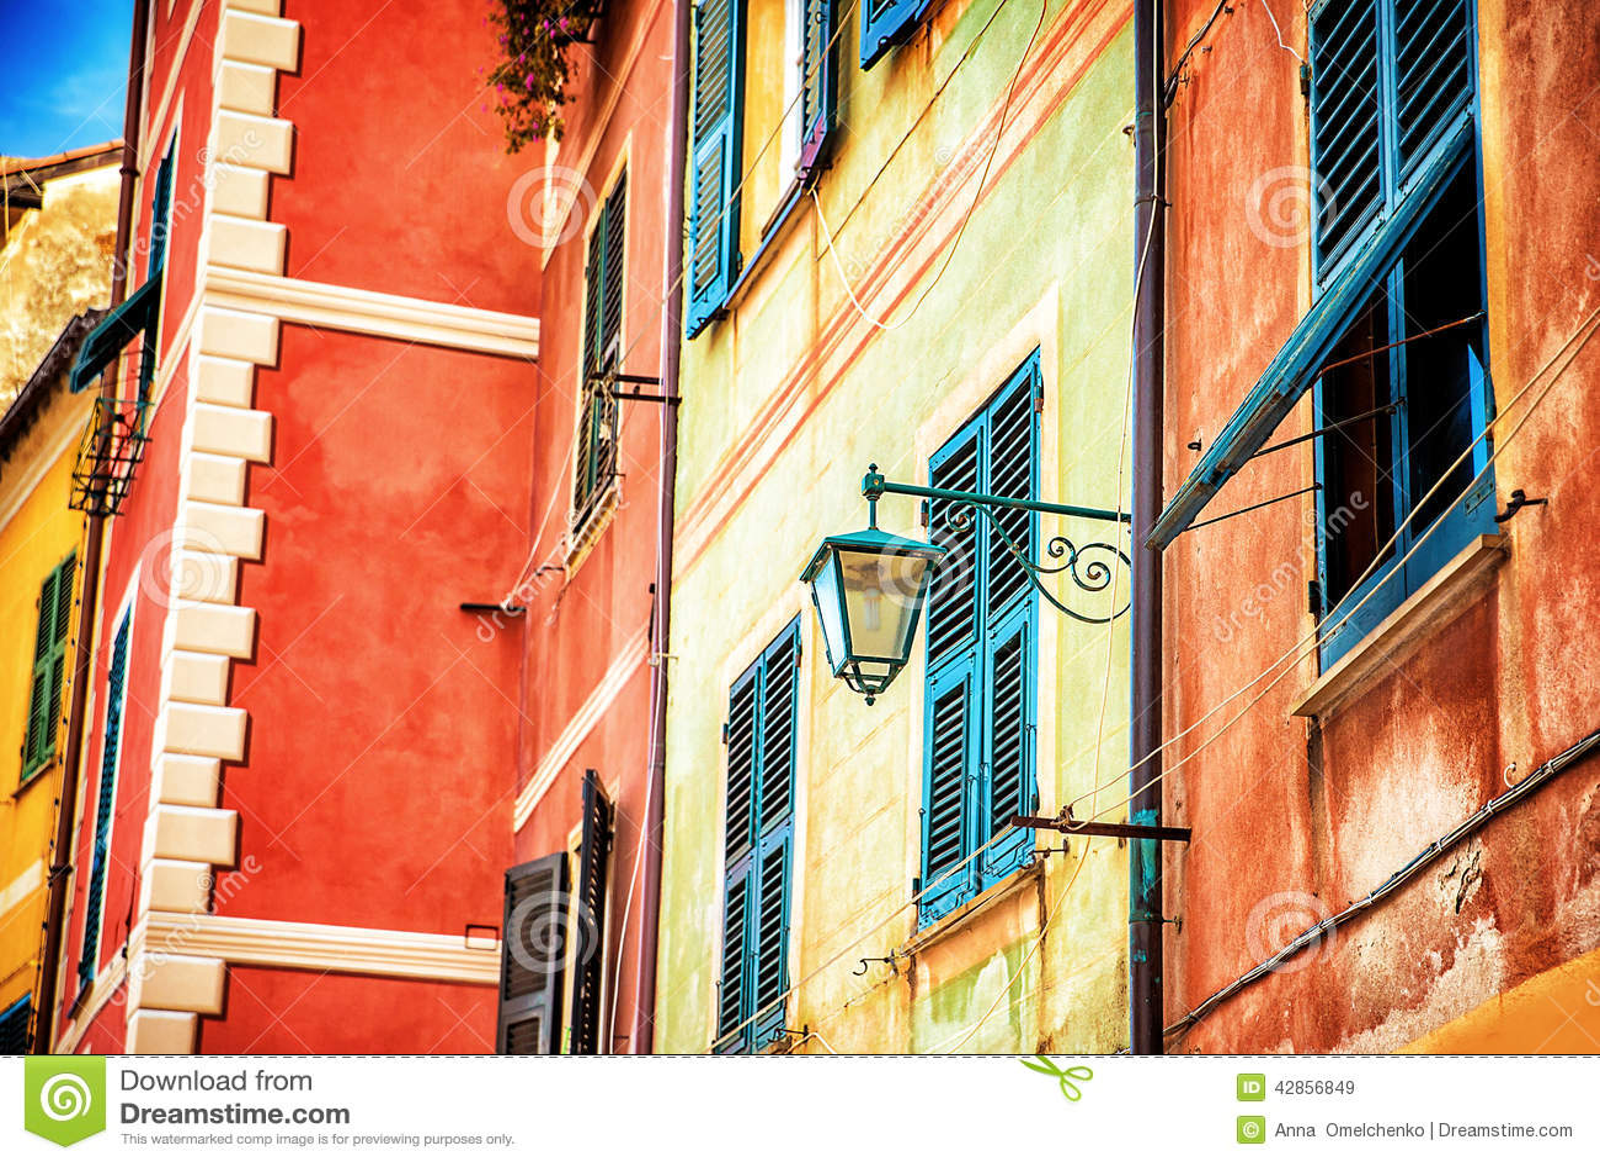 Casa italiana colorida bonita foto de stock imagem 42856849 for Casa italiana